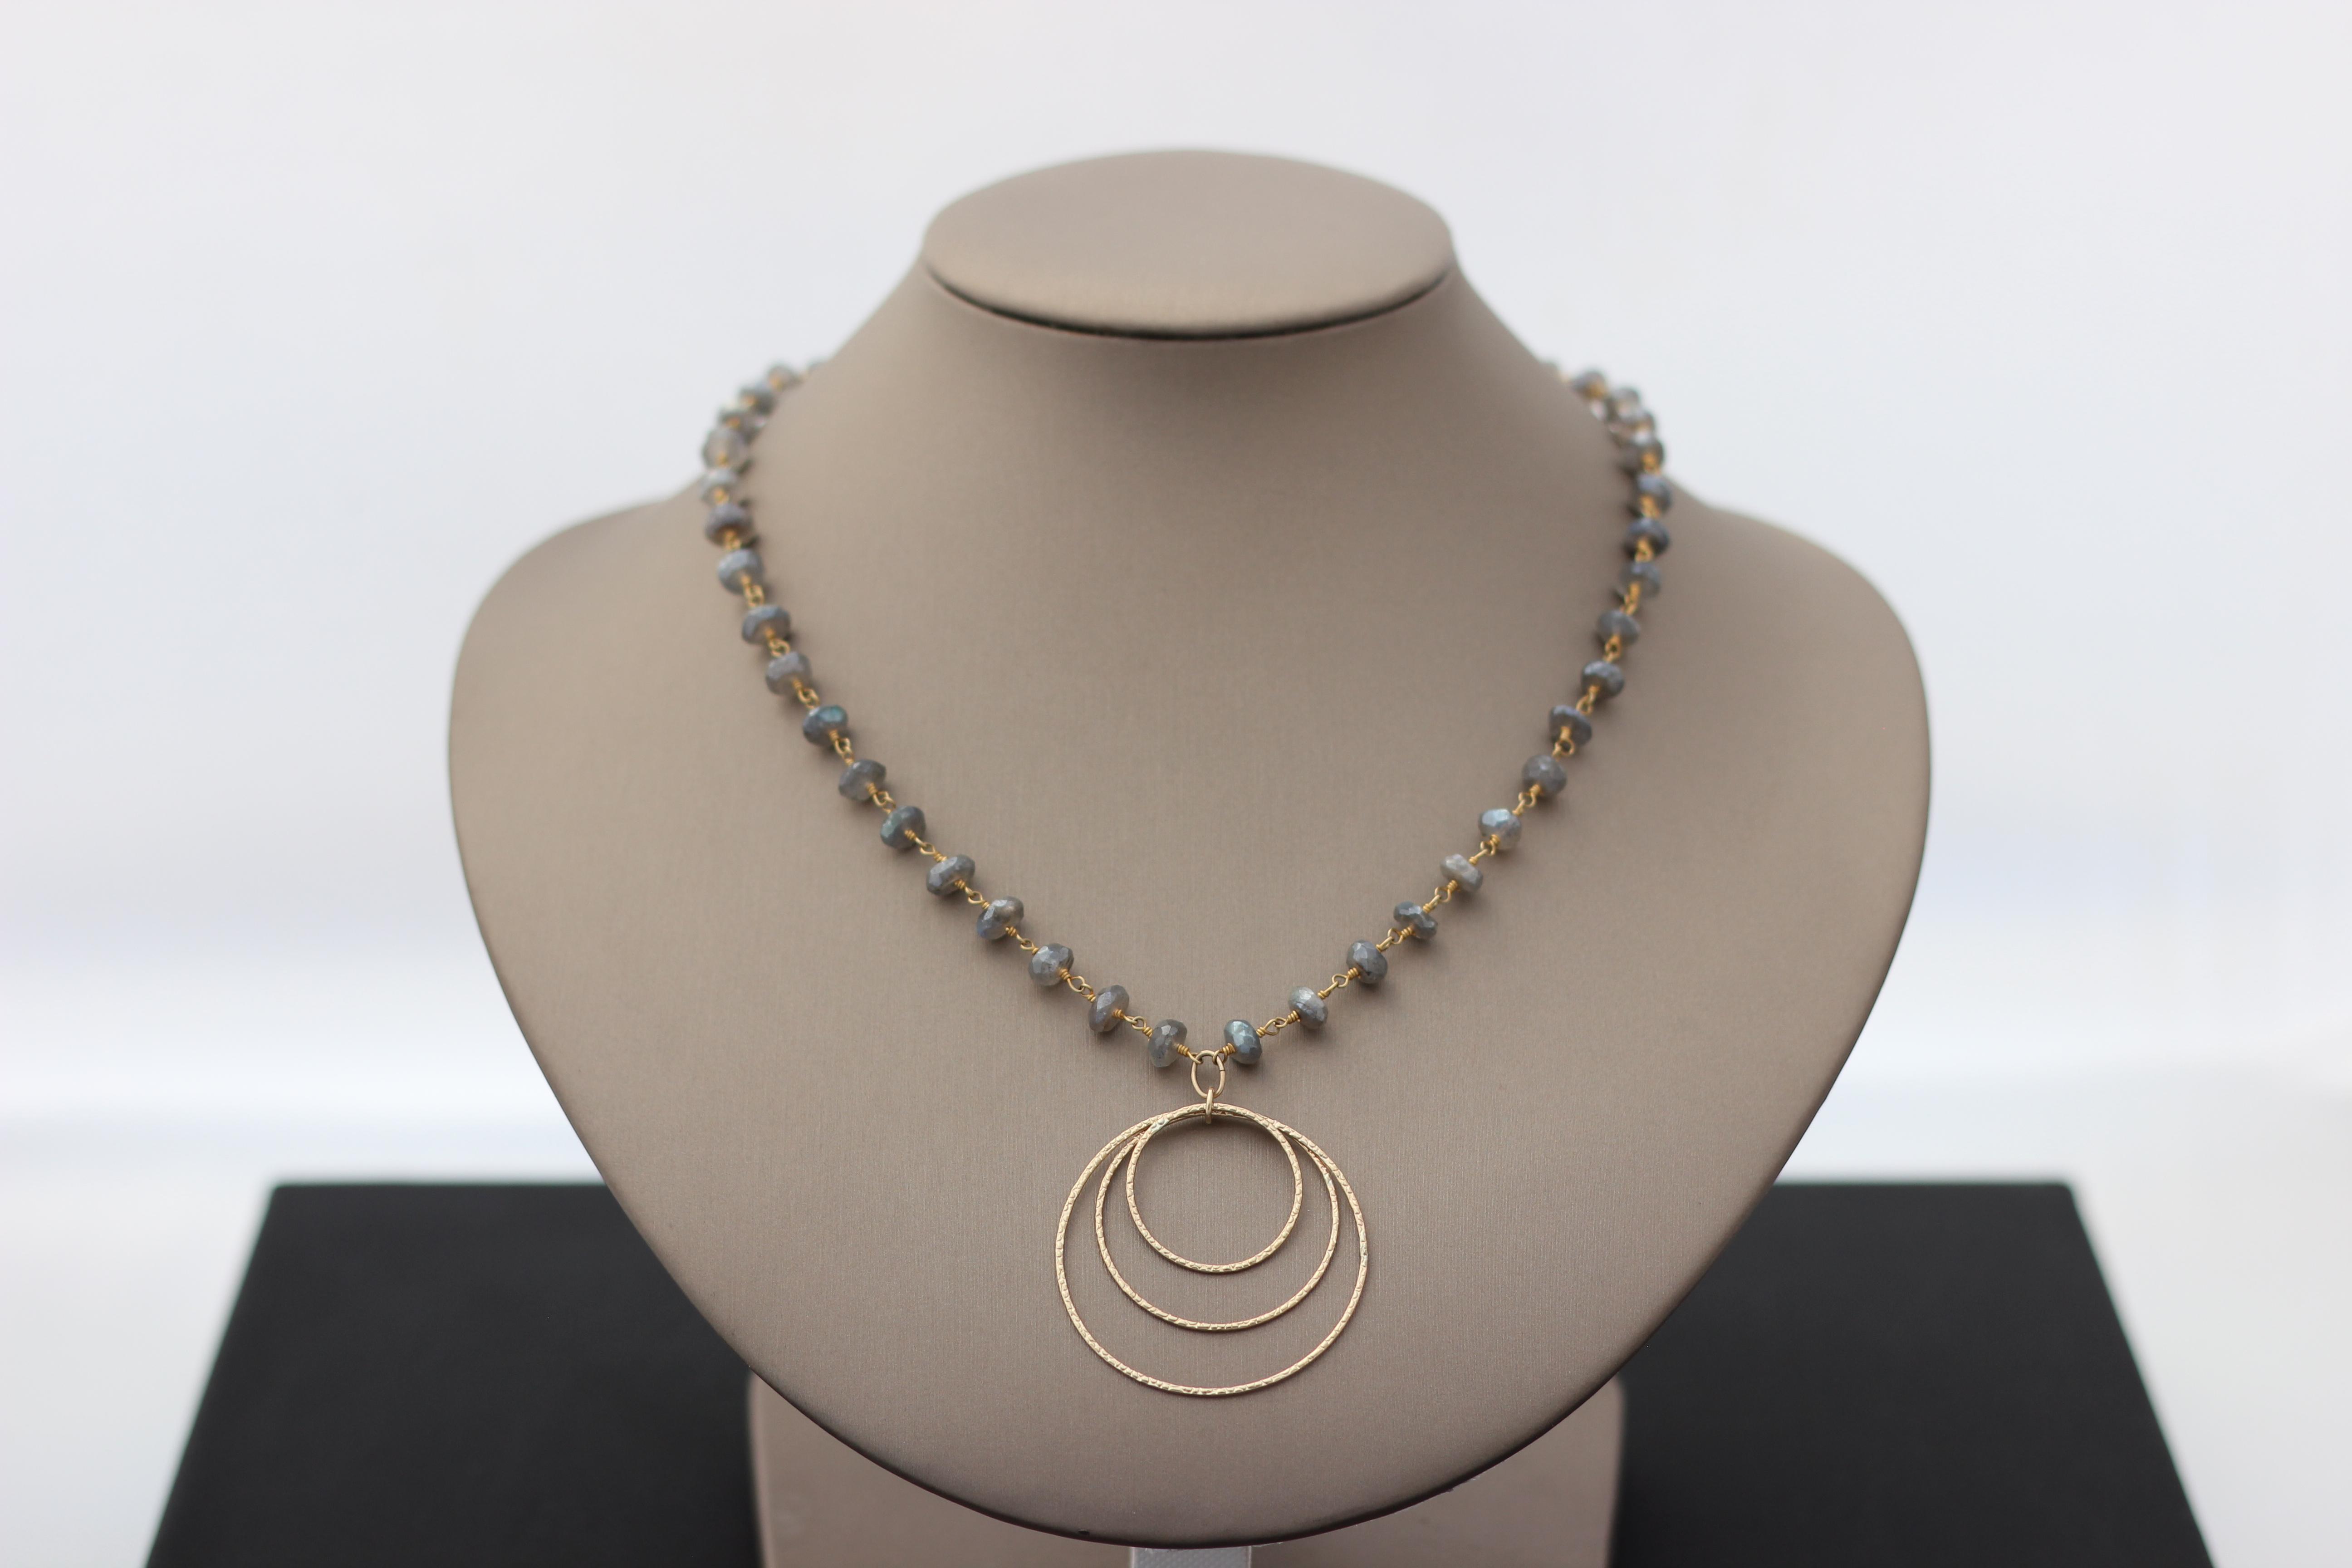 13. Mystic Labradorite, Circles | $138